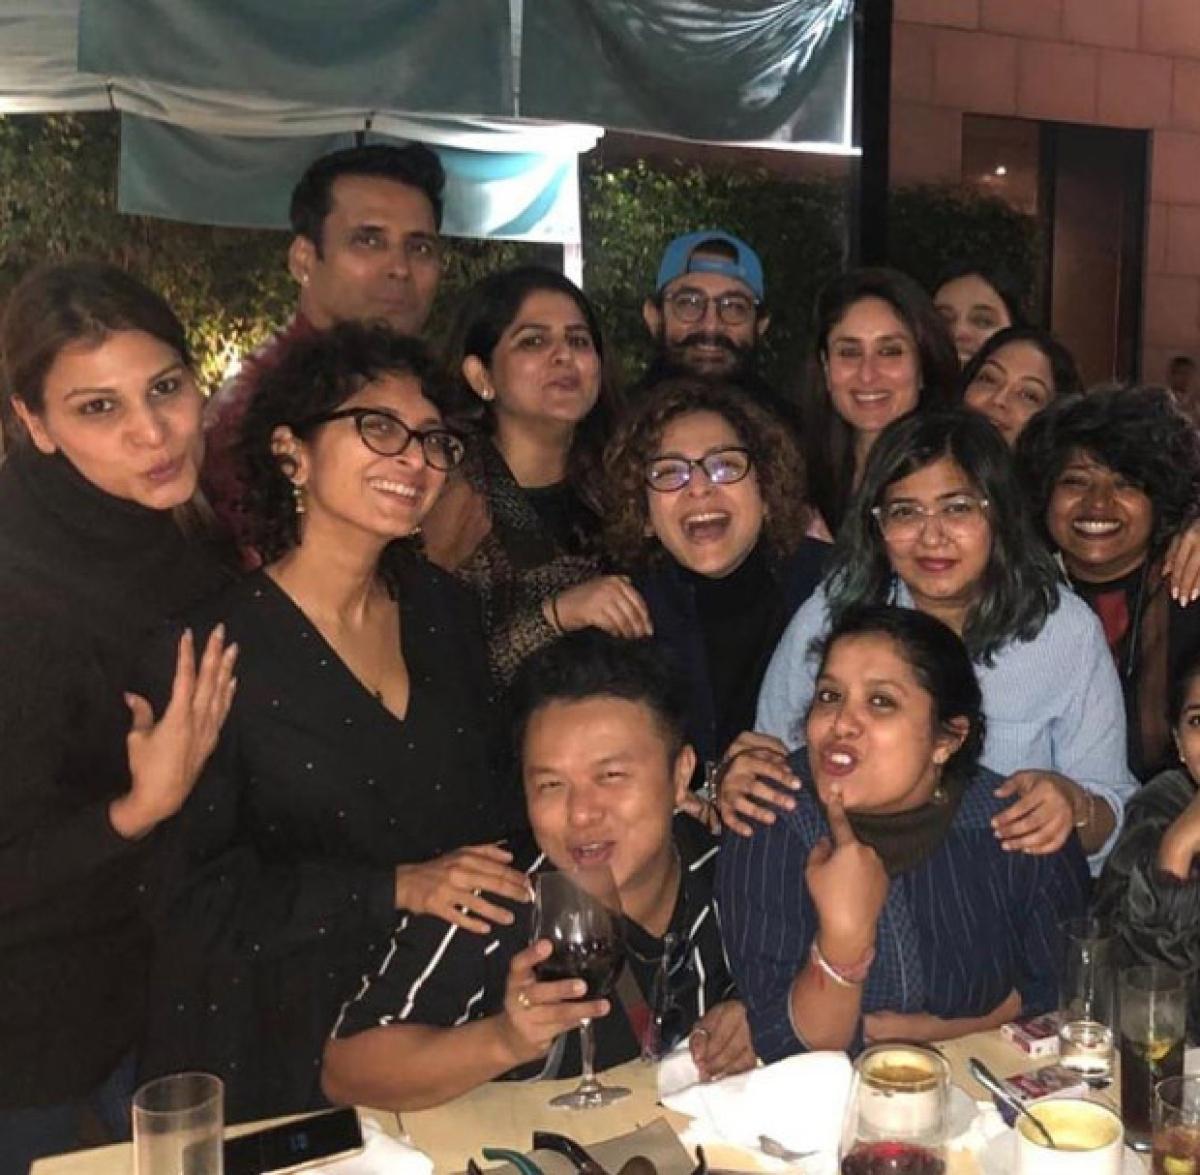 Laal Singh Chaddha: Aamir Khan, Kareena Kapoor Khan enjoy team dinner in Punjab